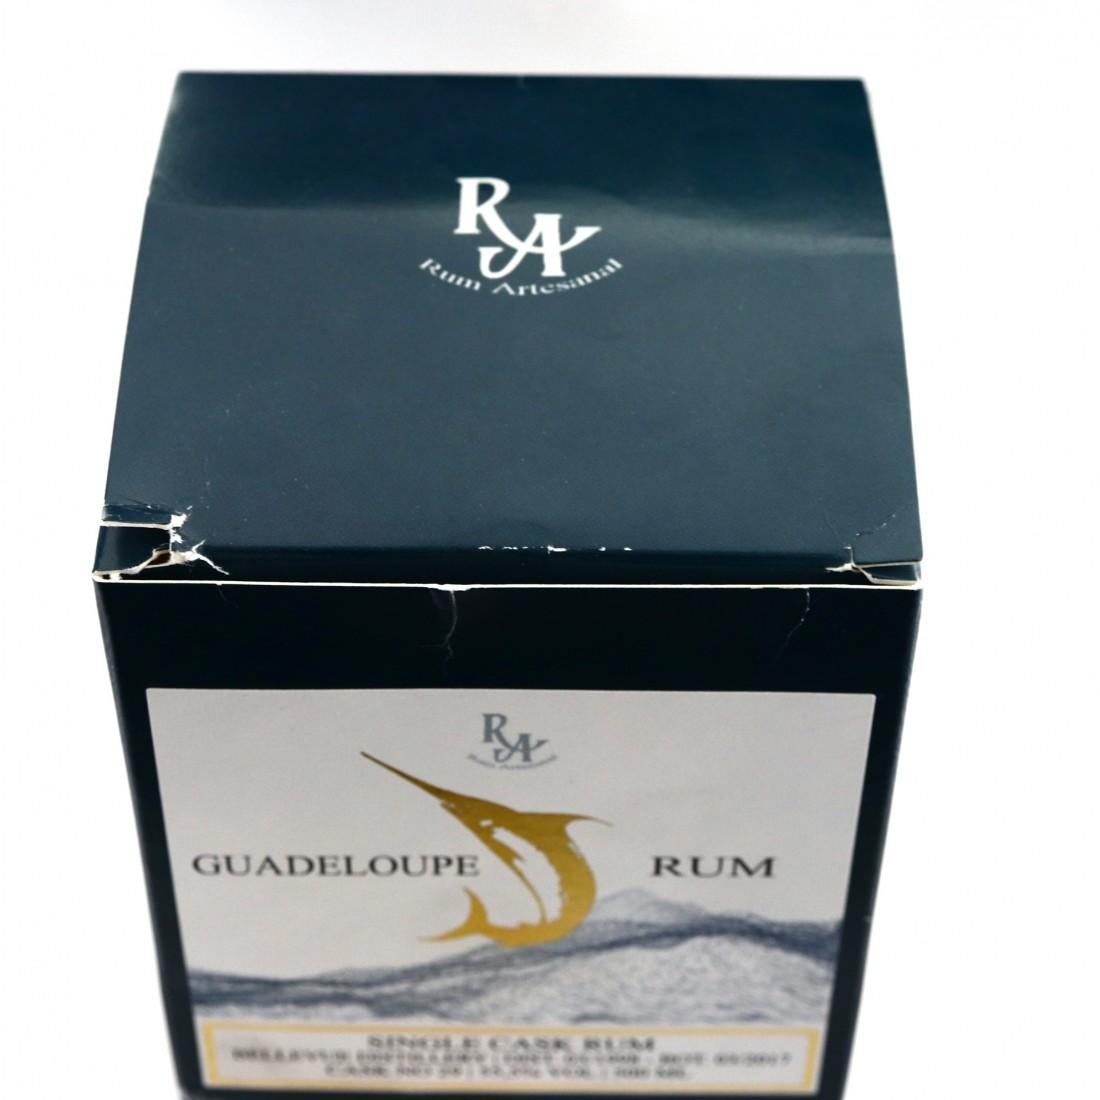 Bellevue 1998 Rum Artesanal 50cl